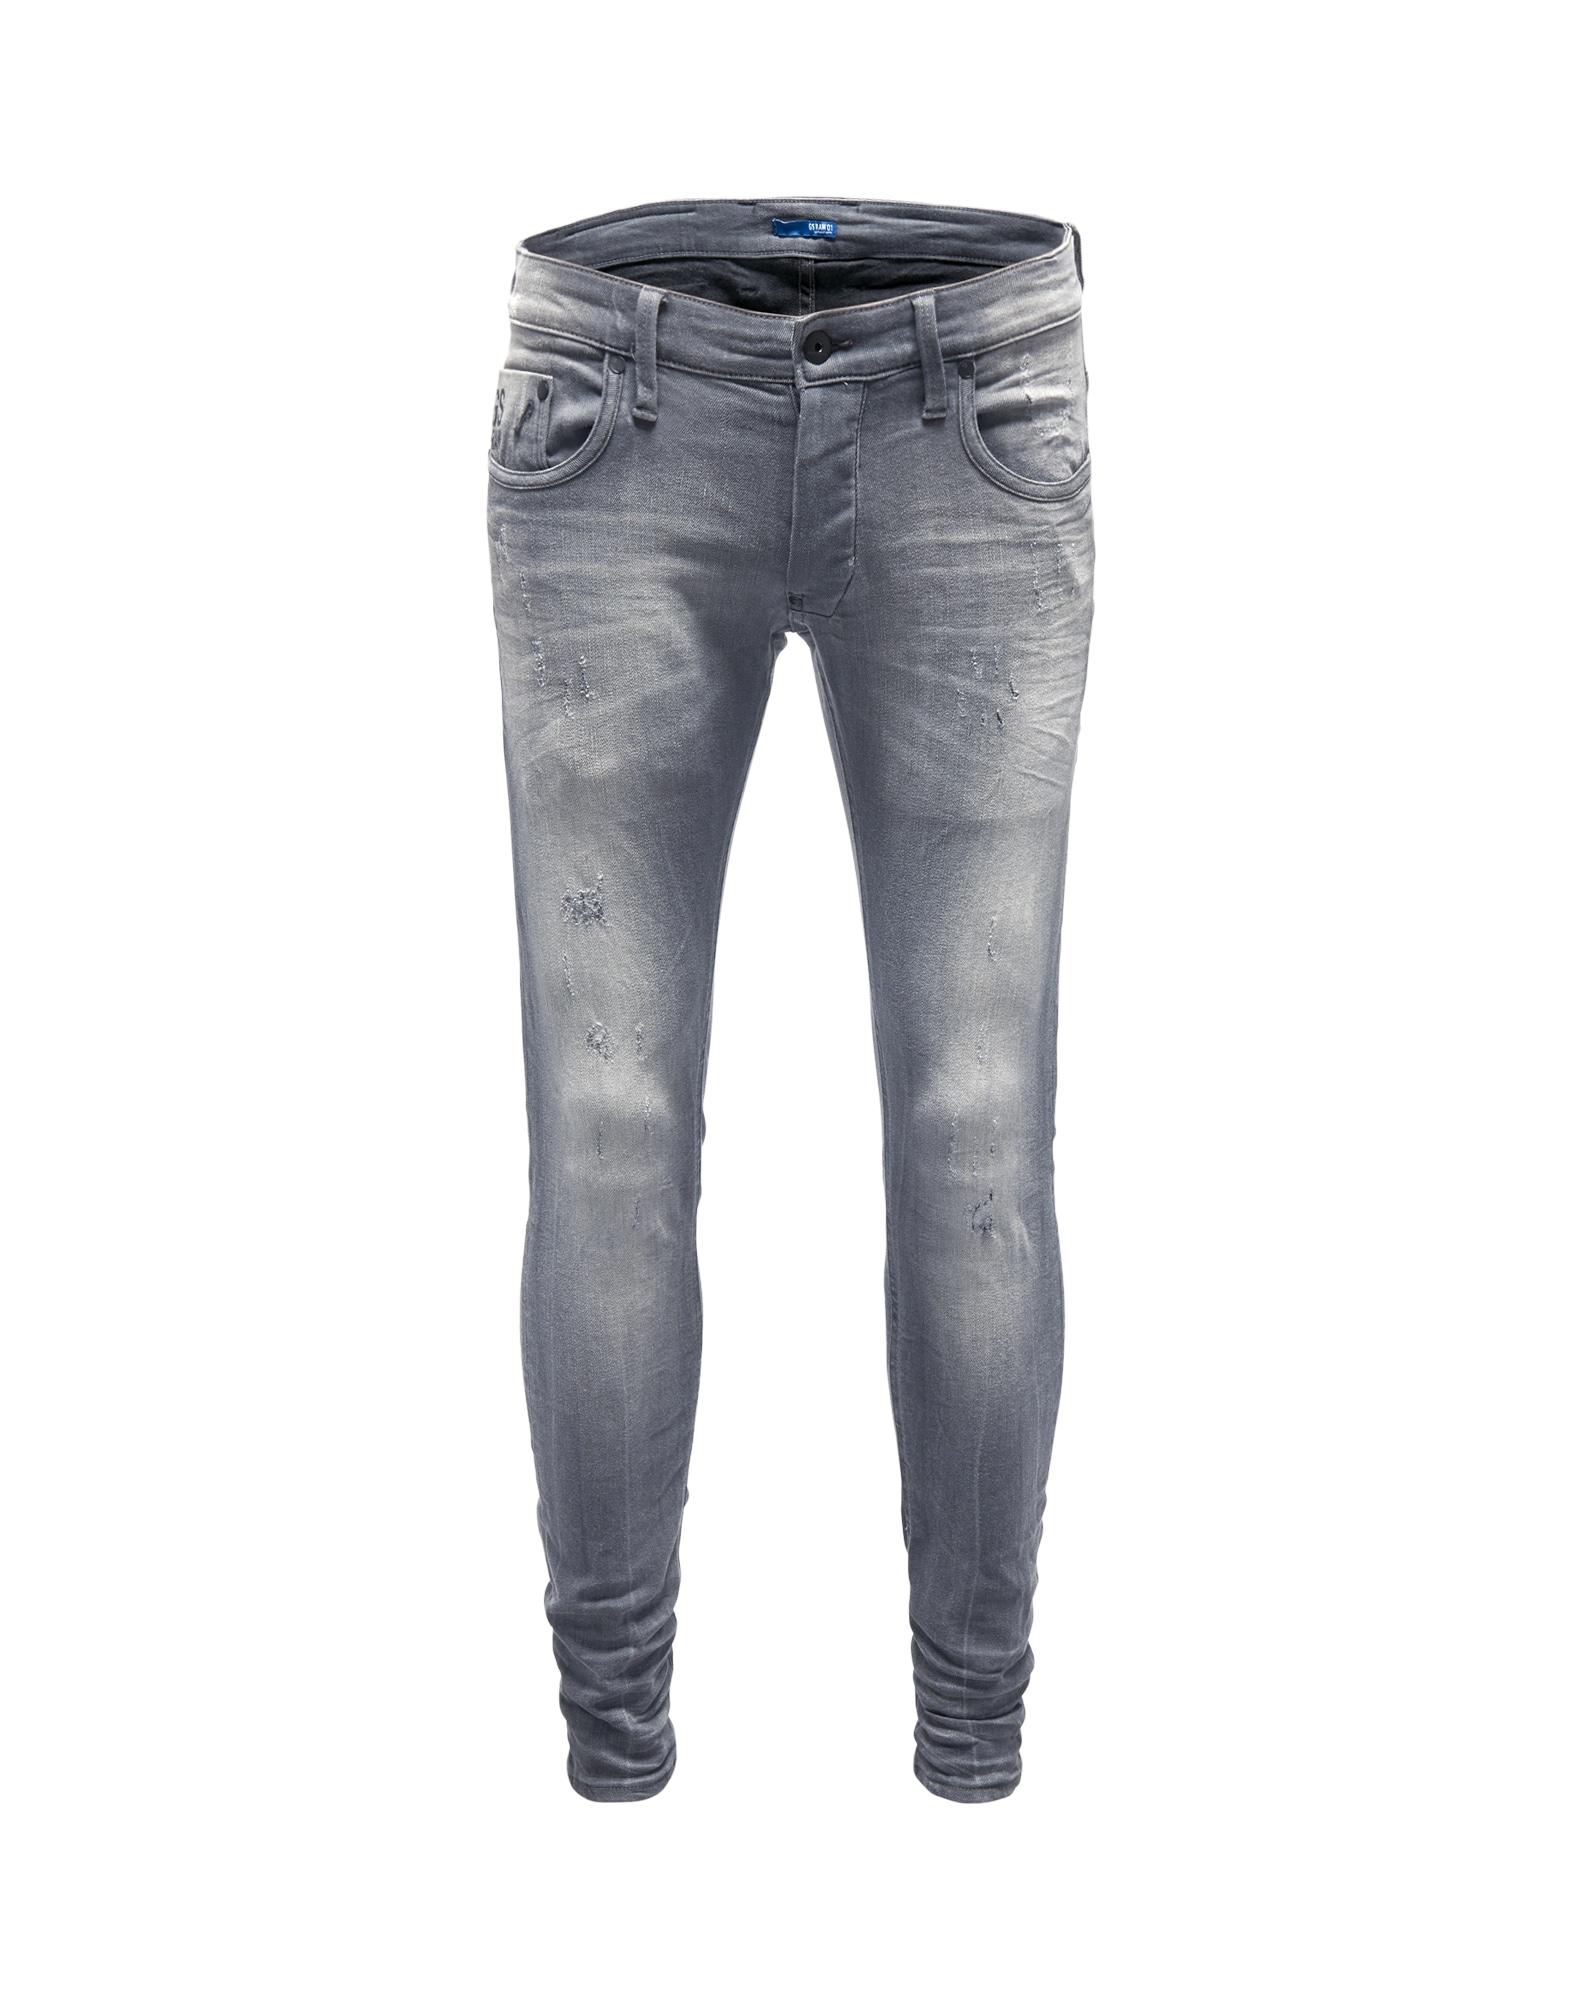 G-STAR RAW Heren Jeans Revend Super Slim grijs